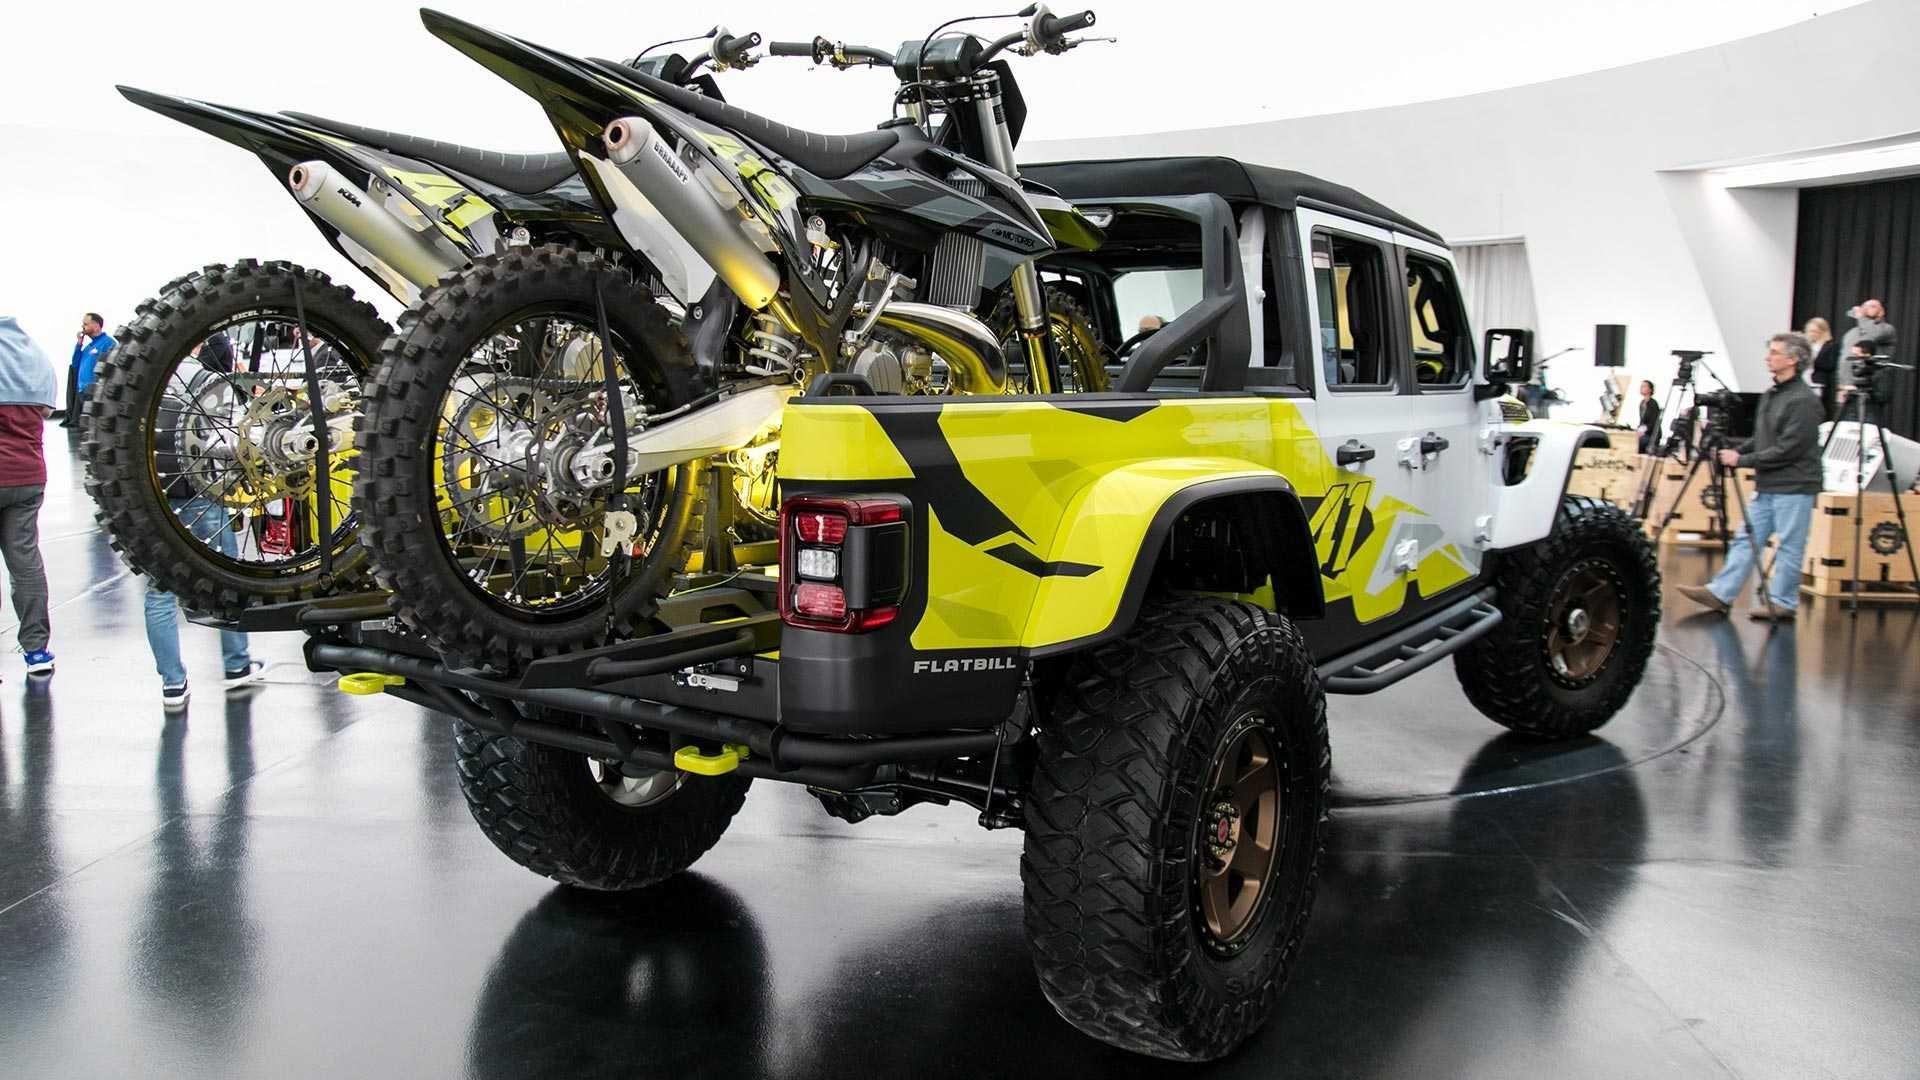 Jeep Gladiator Flatbill Is The Motocross Fan S Pickup Truck Jeep Gladiator Easter Jeep Safari Gladiator